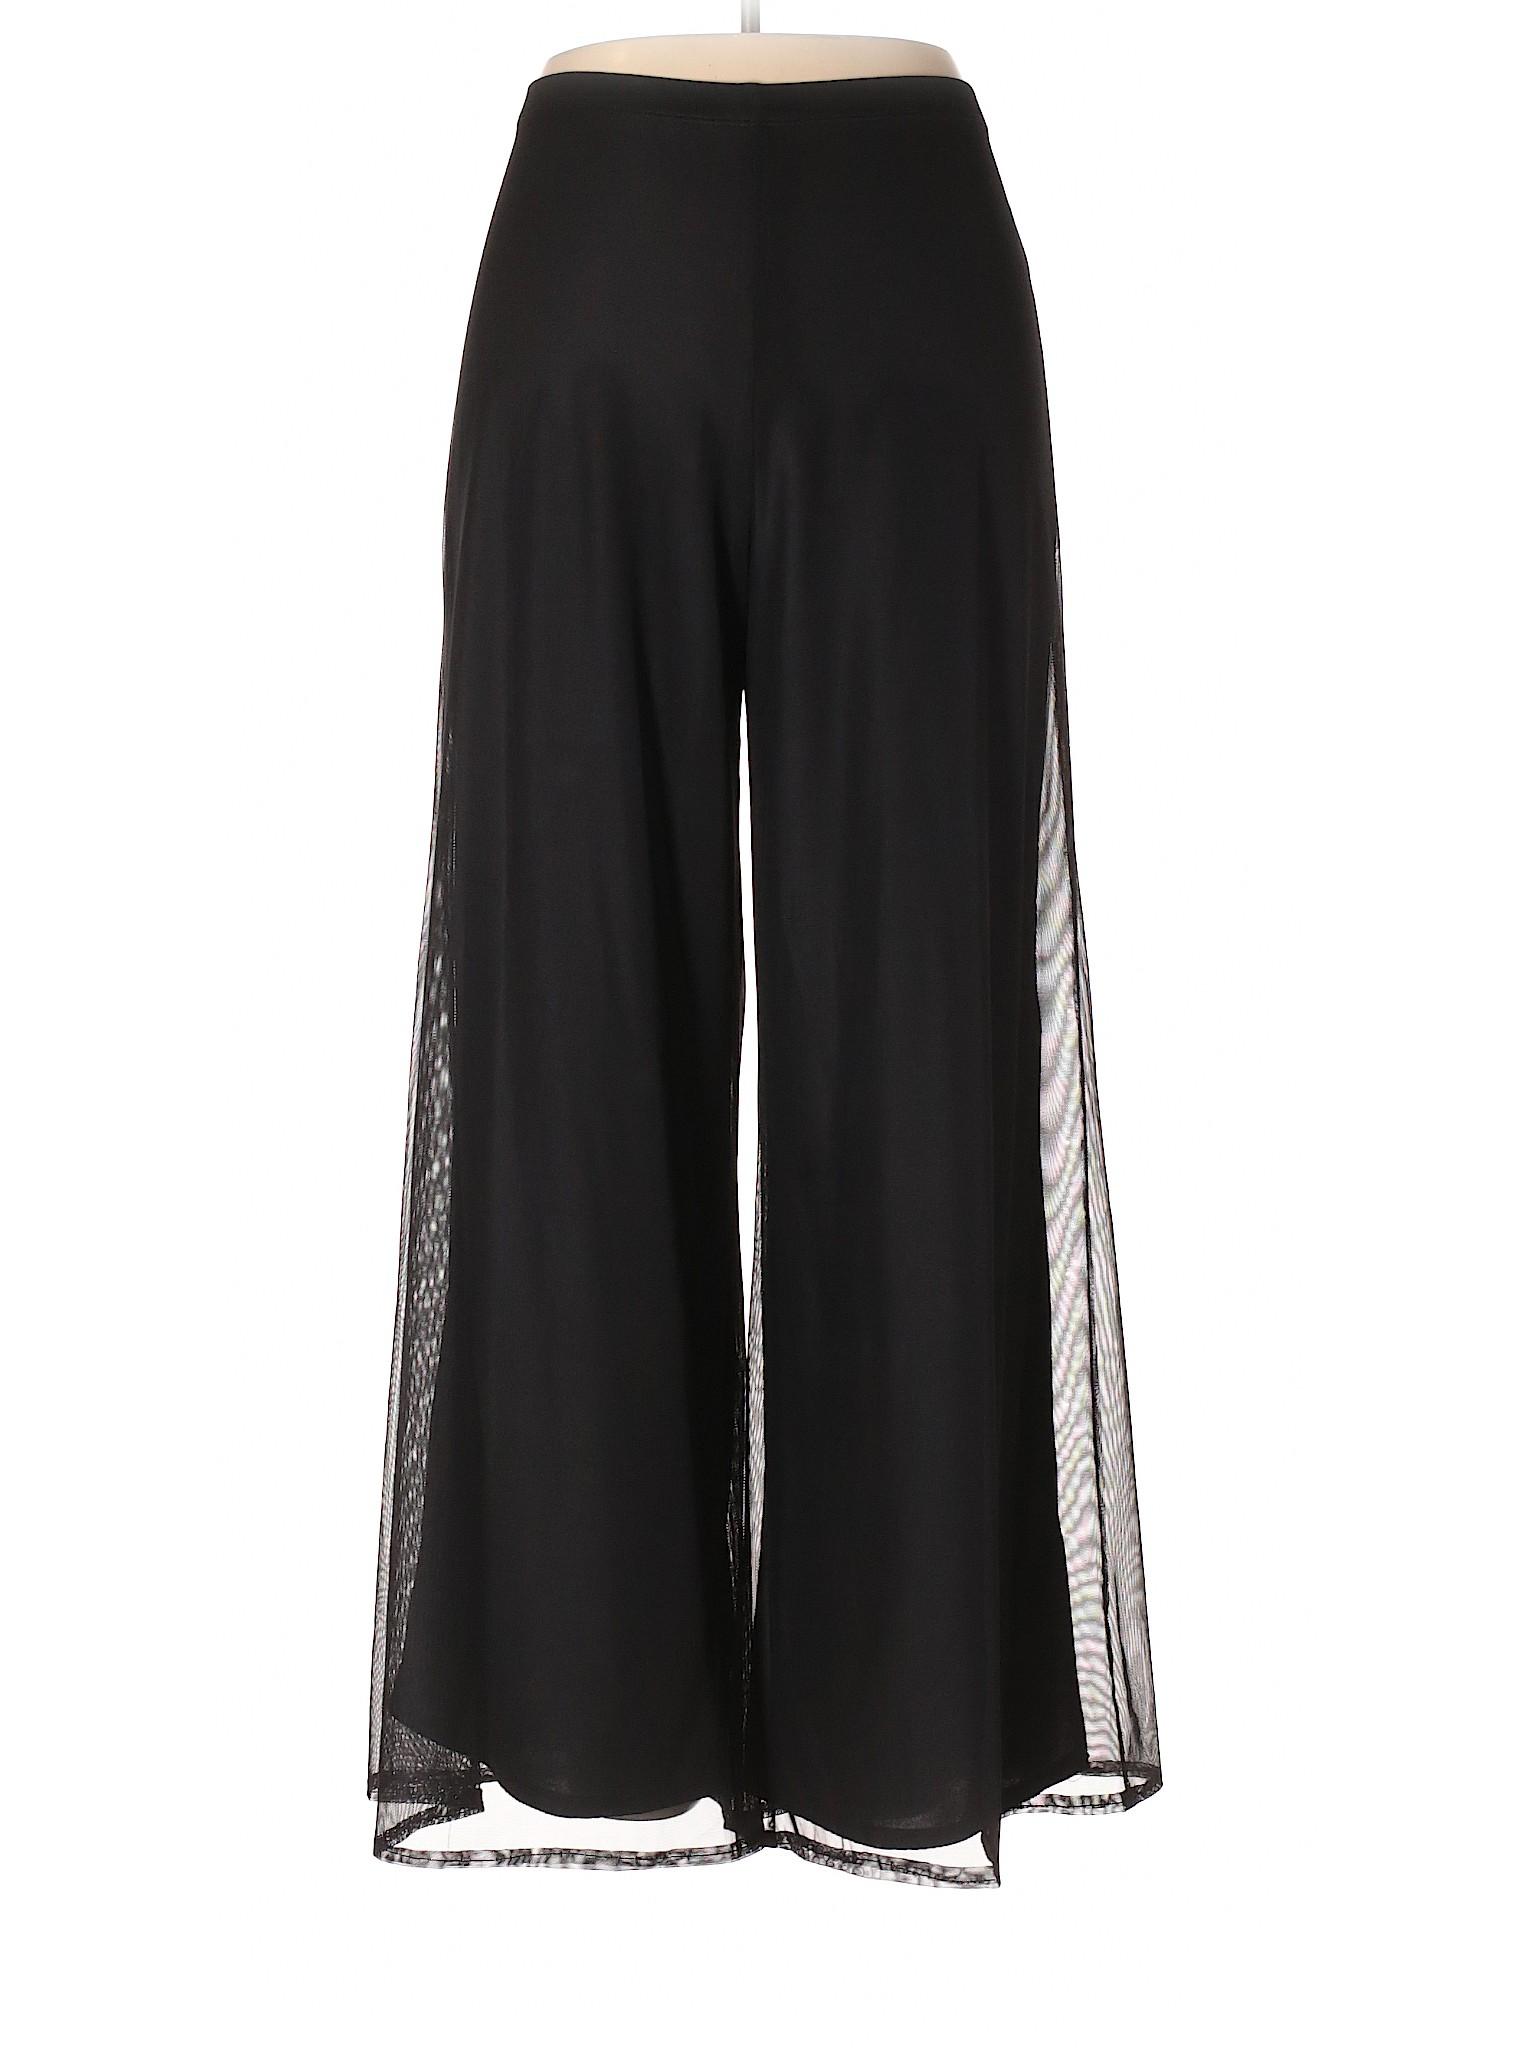 Collection winter Pants Casual Boutique JS WZa61q6gp